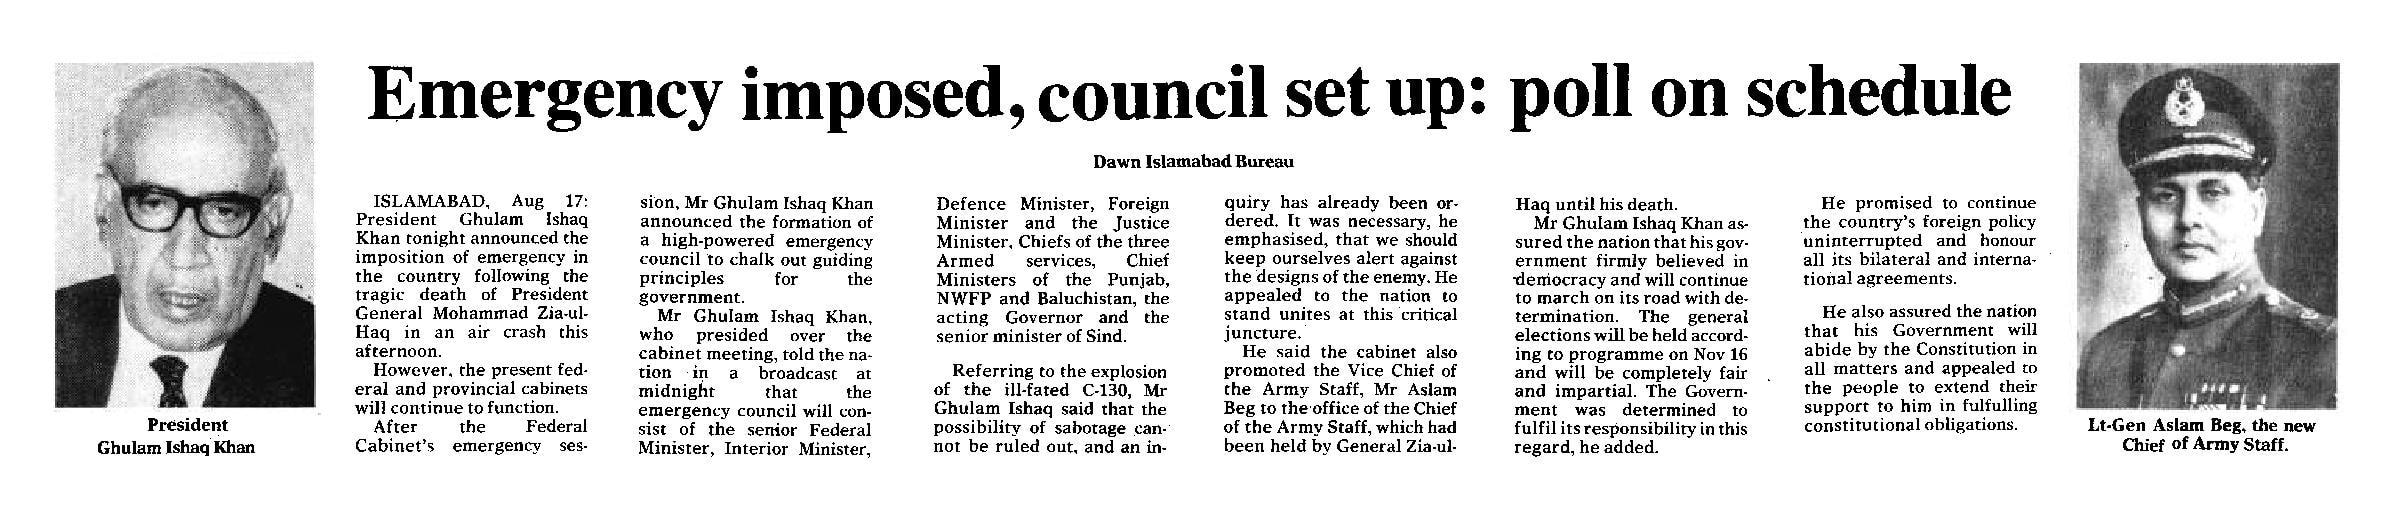 Aug 18, 1988